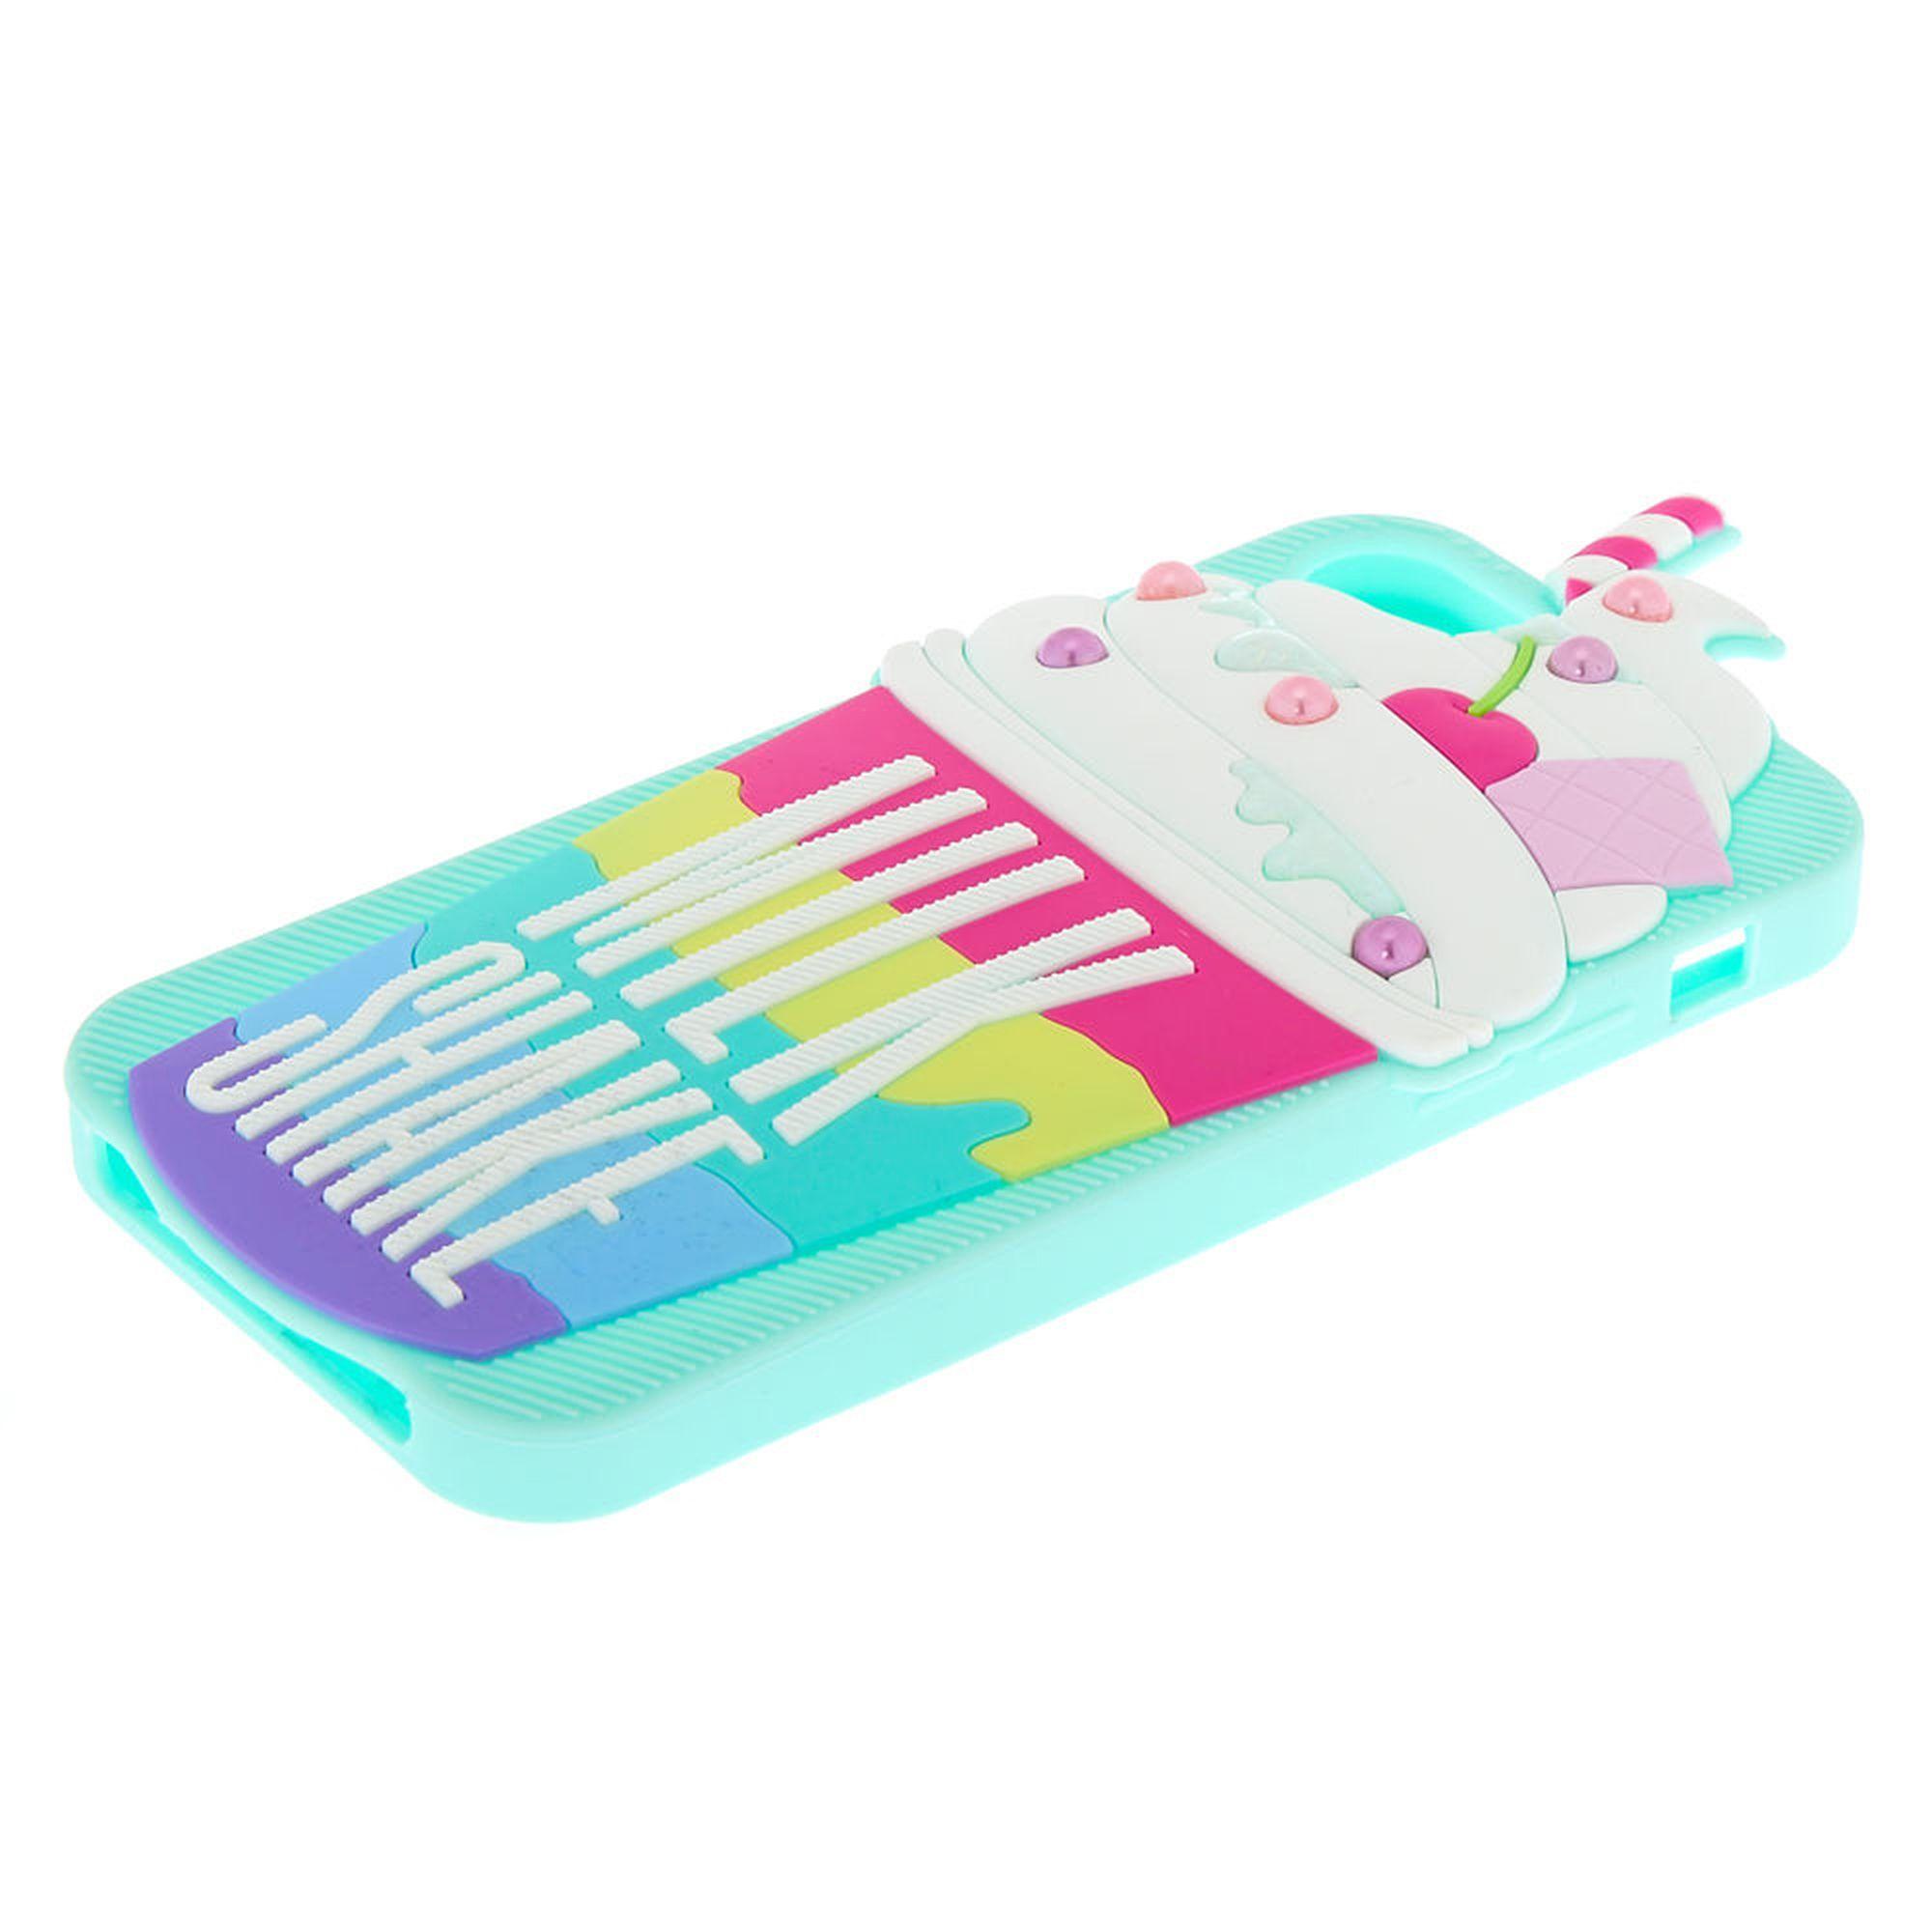 Unicorn Milkshake Phone Case - Fits